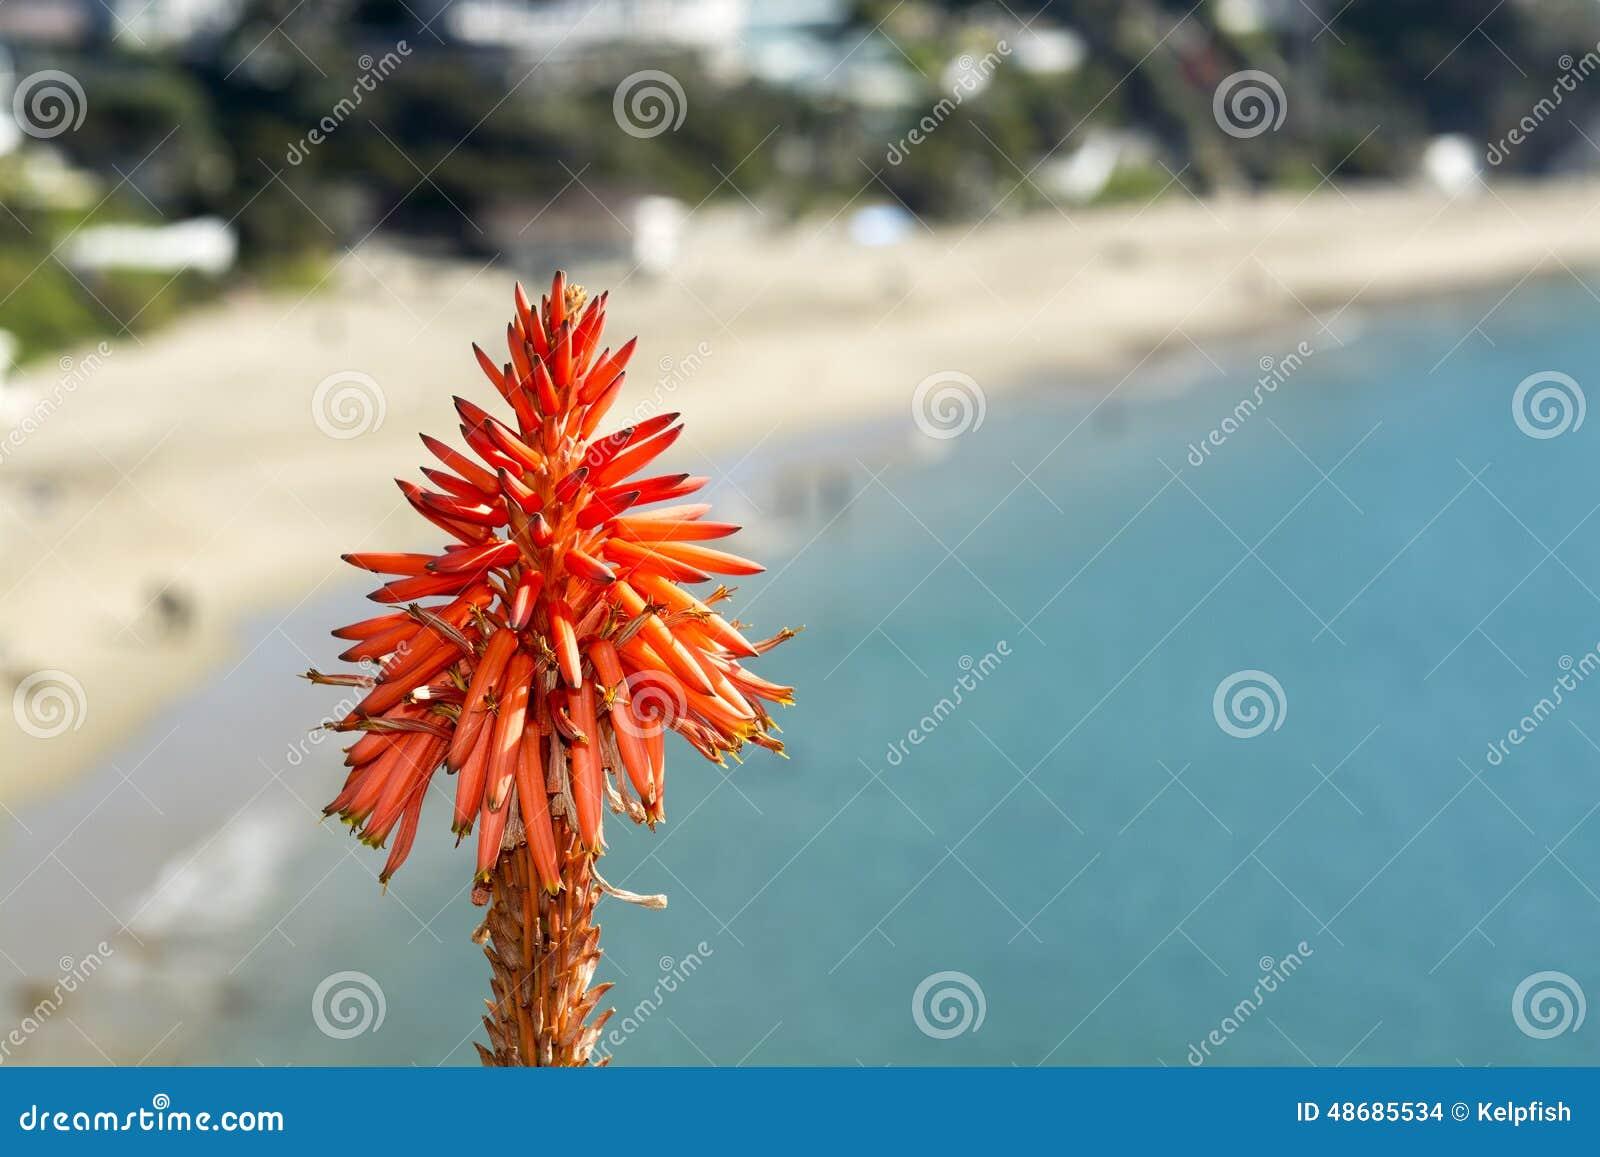 Aloe plant over ocean